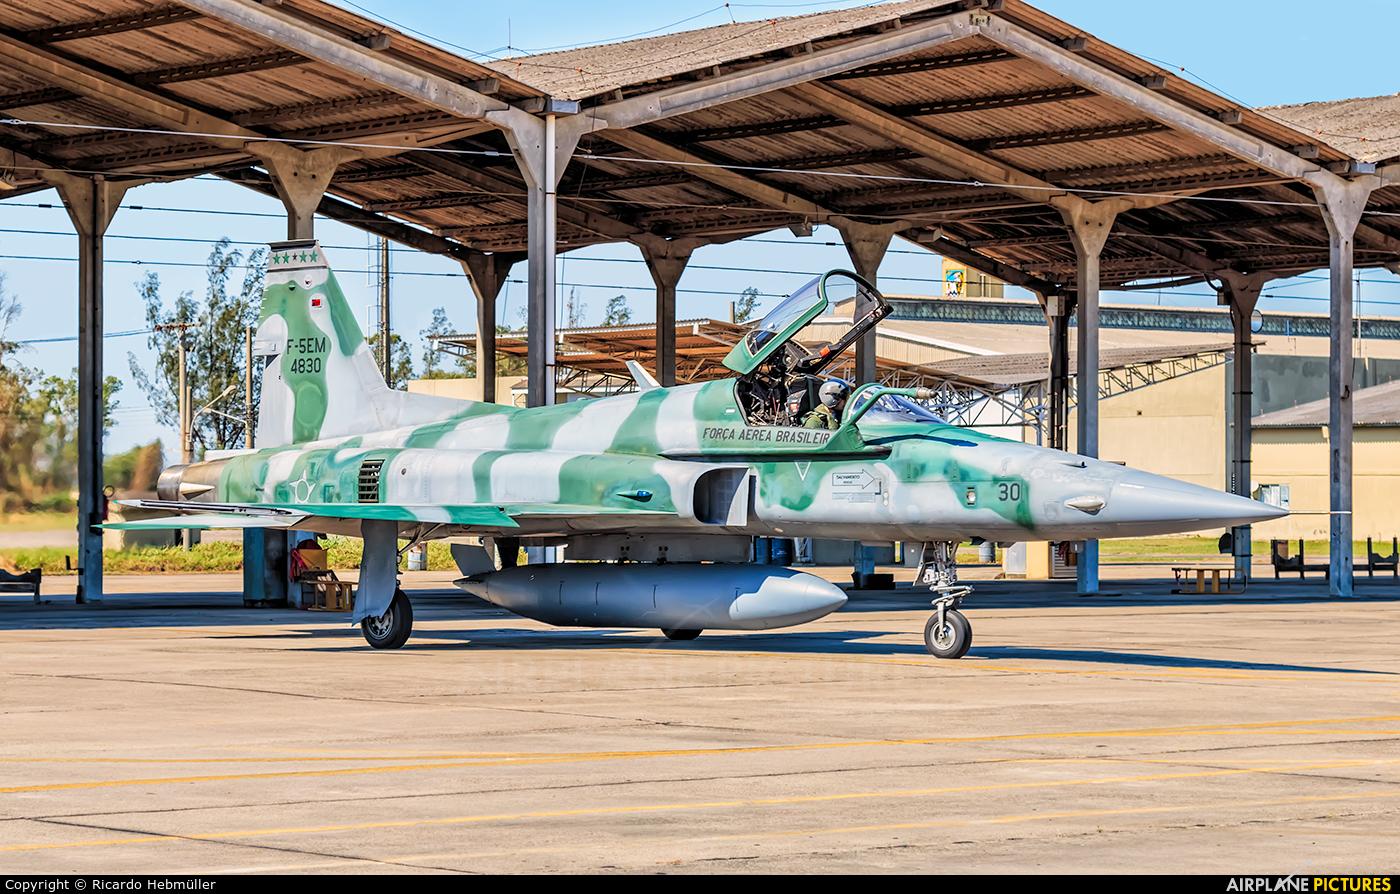 Brazil - Air Force 4830 aircraft at Rio de Janeiro - Santa Cruz